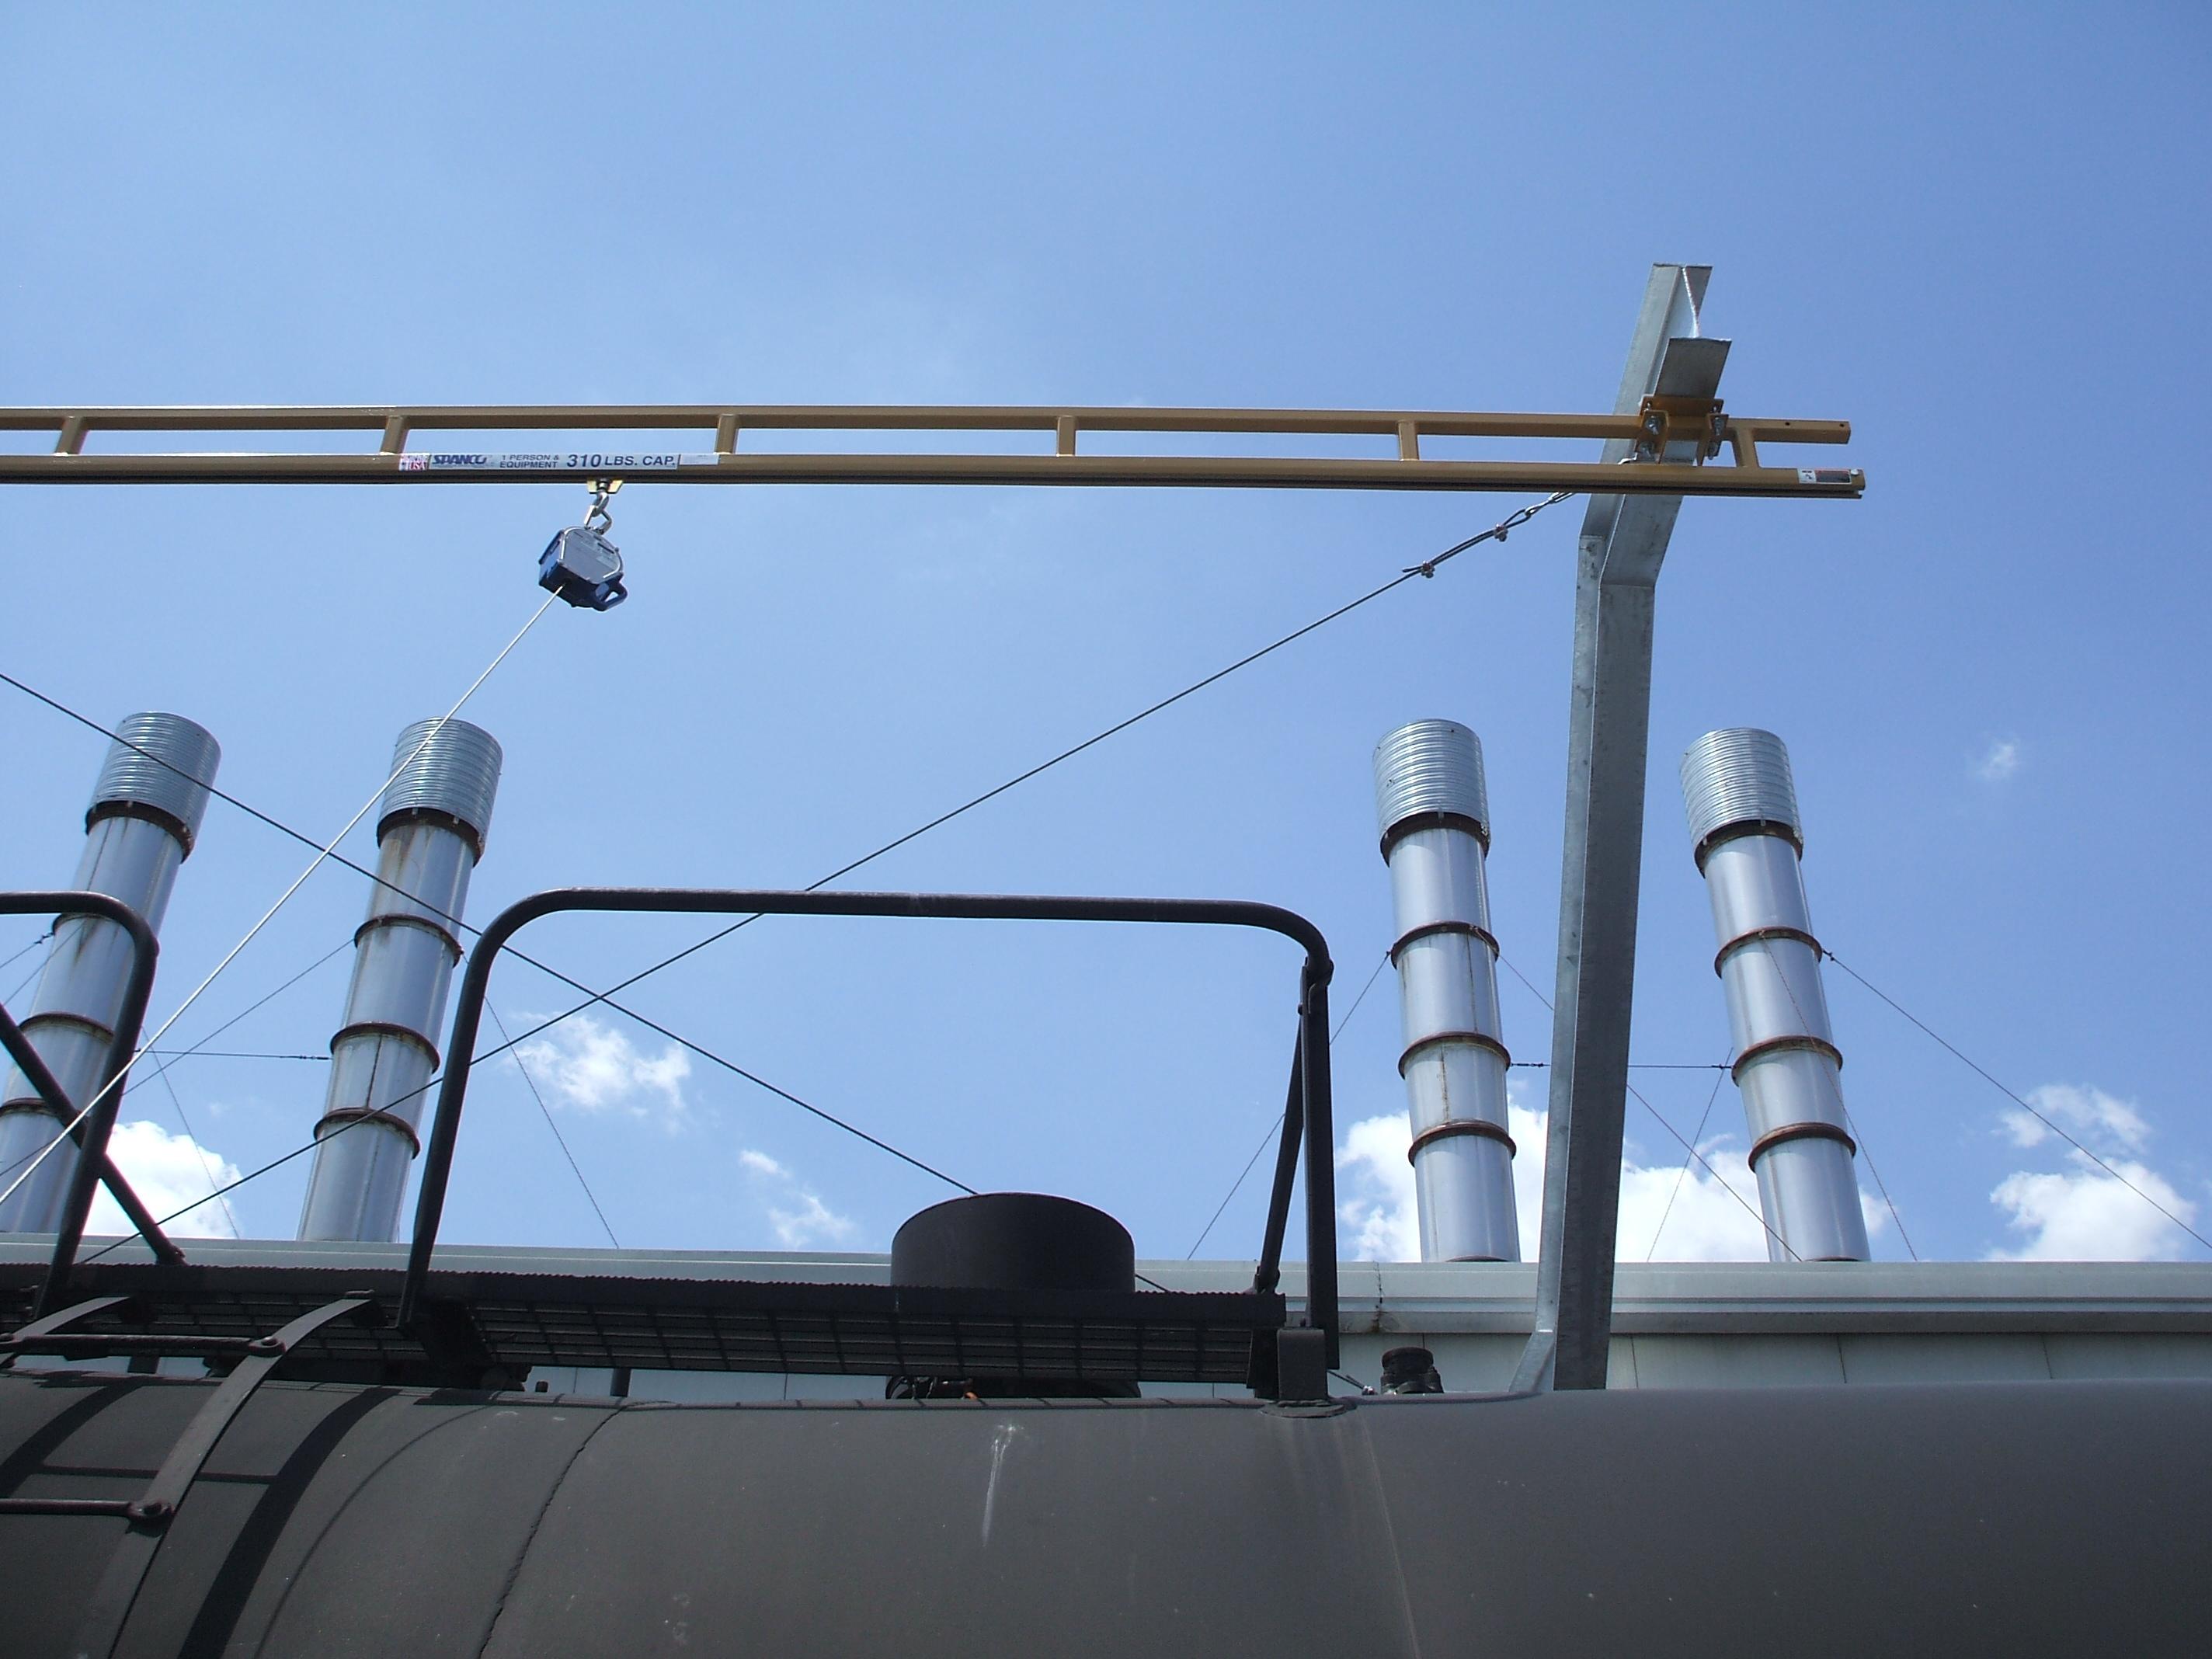 Railcar Rigid Rail & Self-Retracting Lifeline, Engineering ...